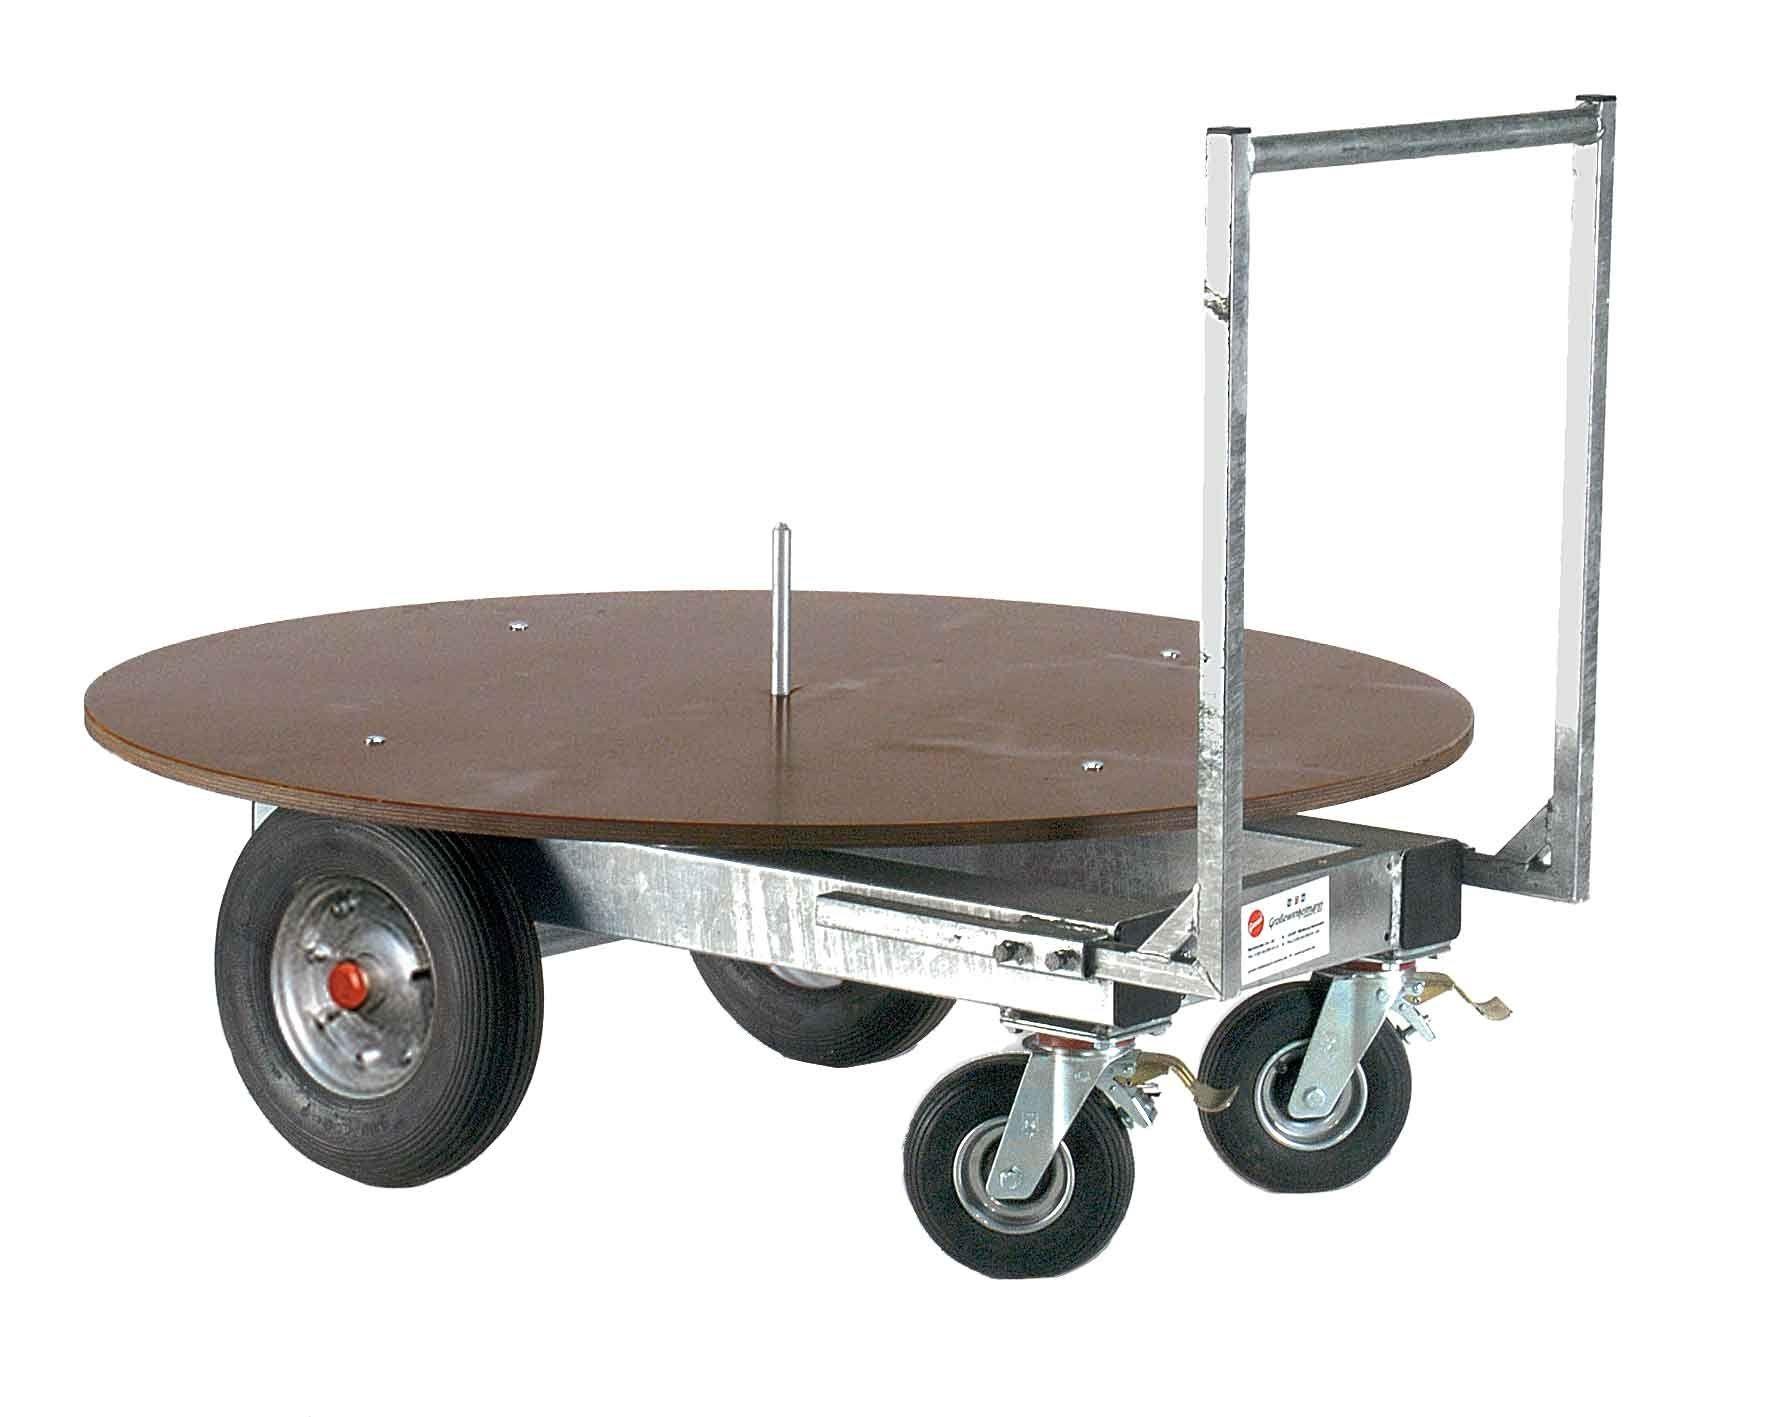 chariot foin pour balle rondes. Black Bedroom Furniture Sets. Home Design Ideas